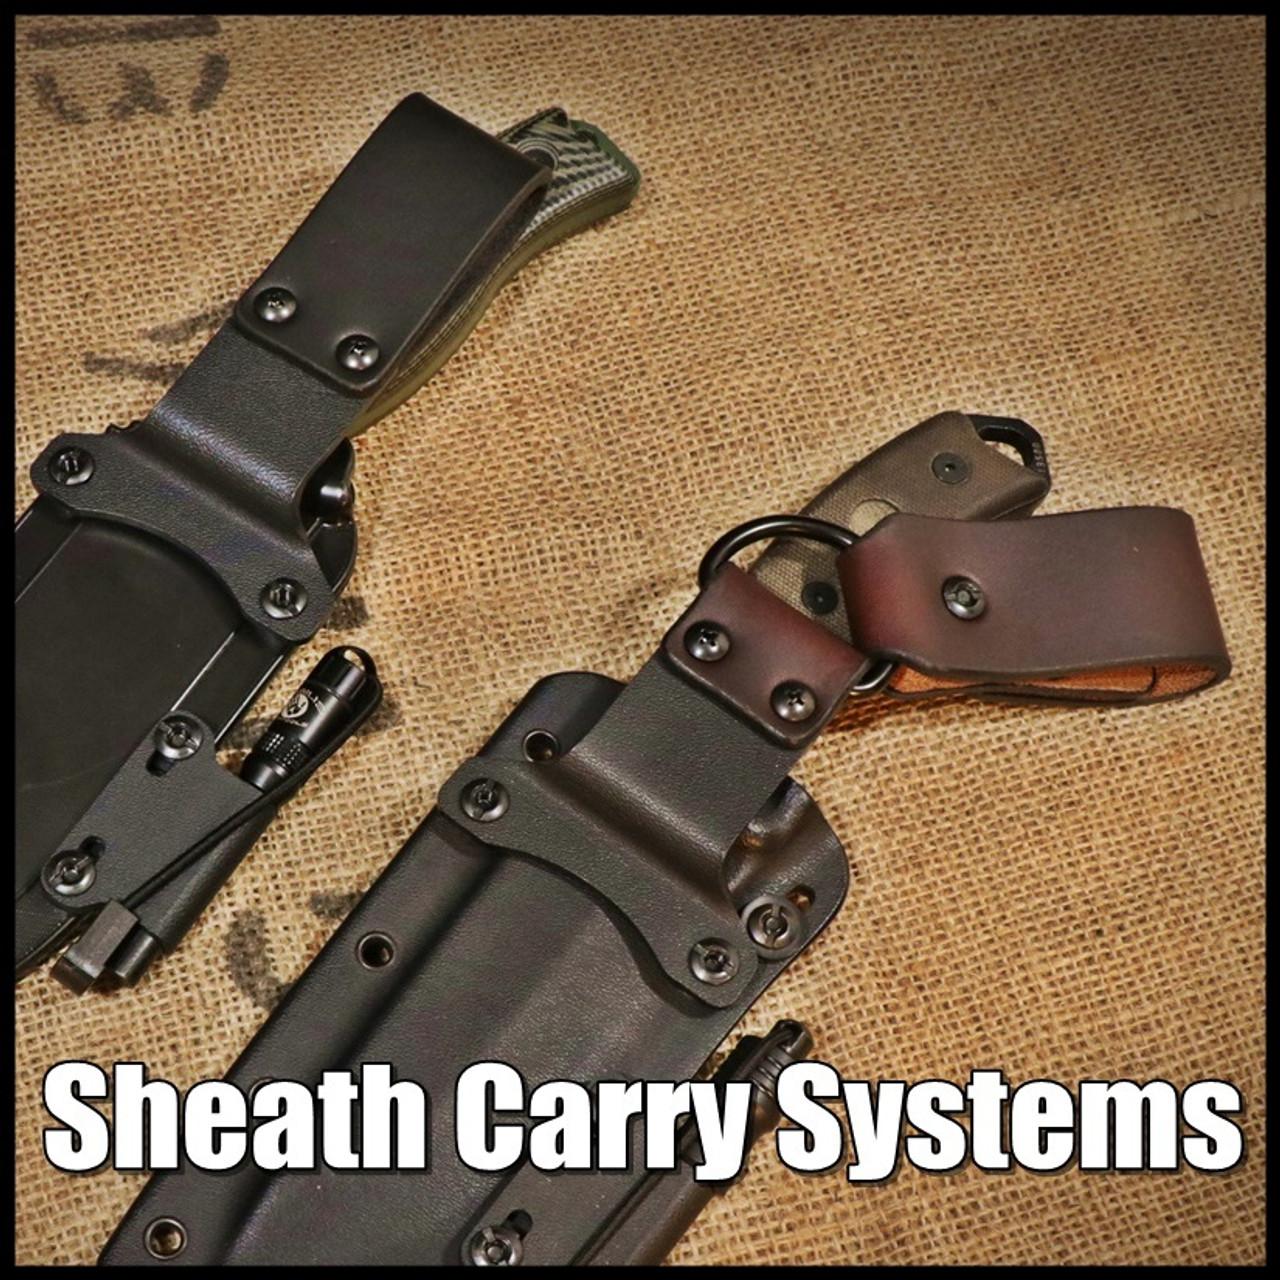 Sheath Carry Systems